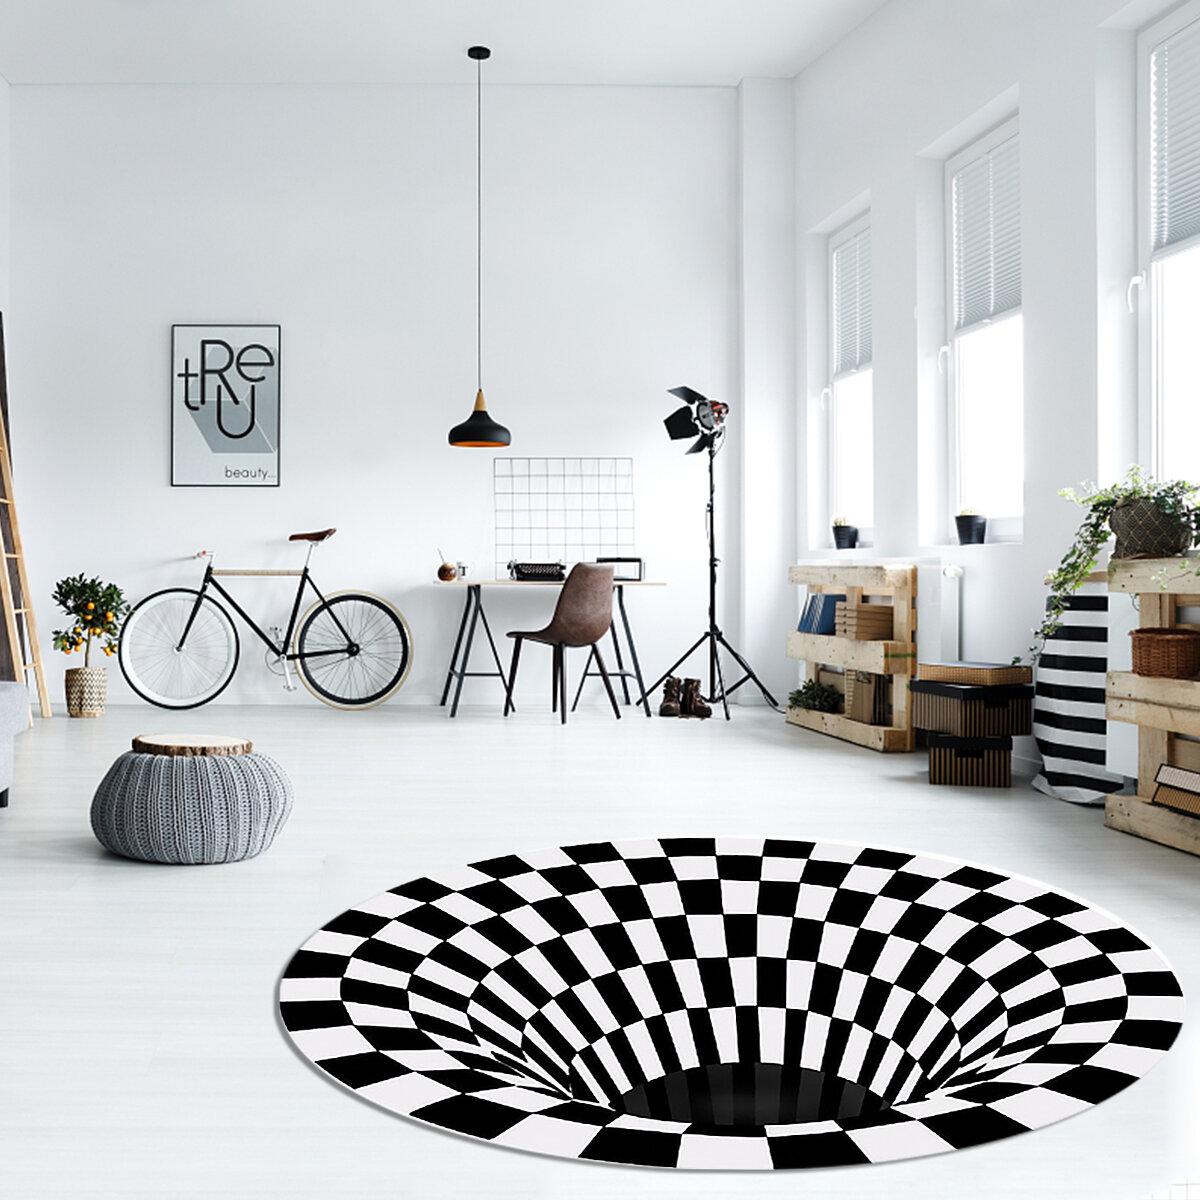 3D Round Carpet, Checkered Vortexs Optical Illusions Non Slip Area Rug, Durbale Anti-Slip Floor Mat Non-Woven Black Whit